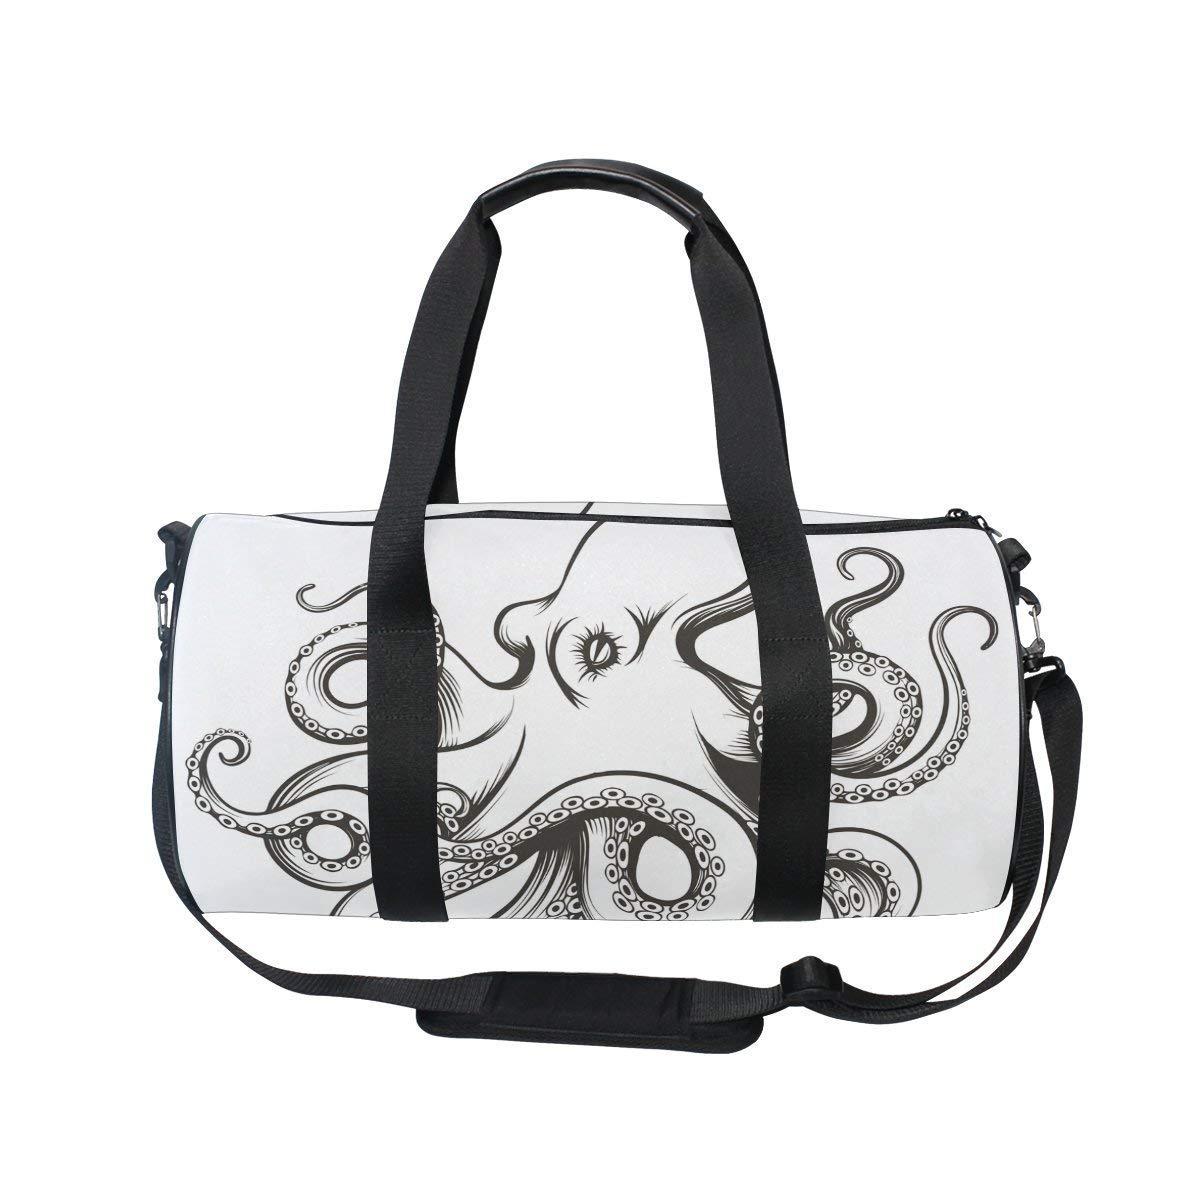 OuLian Gym Duffel Bag Flower Floral Sports Lightweight Canvas Travel Luggage Bag